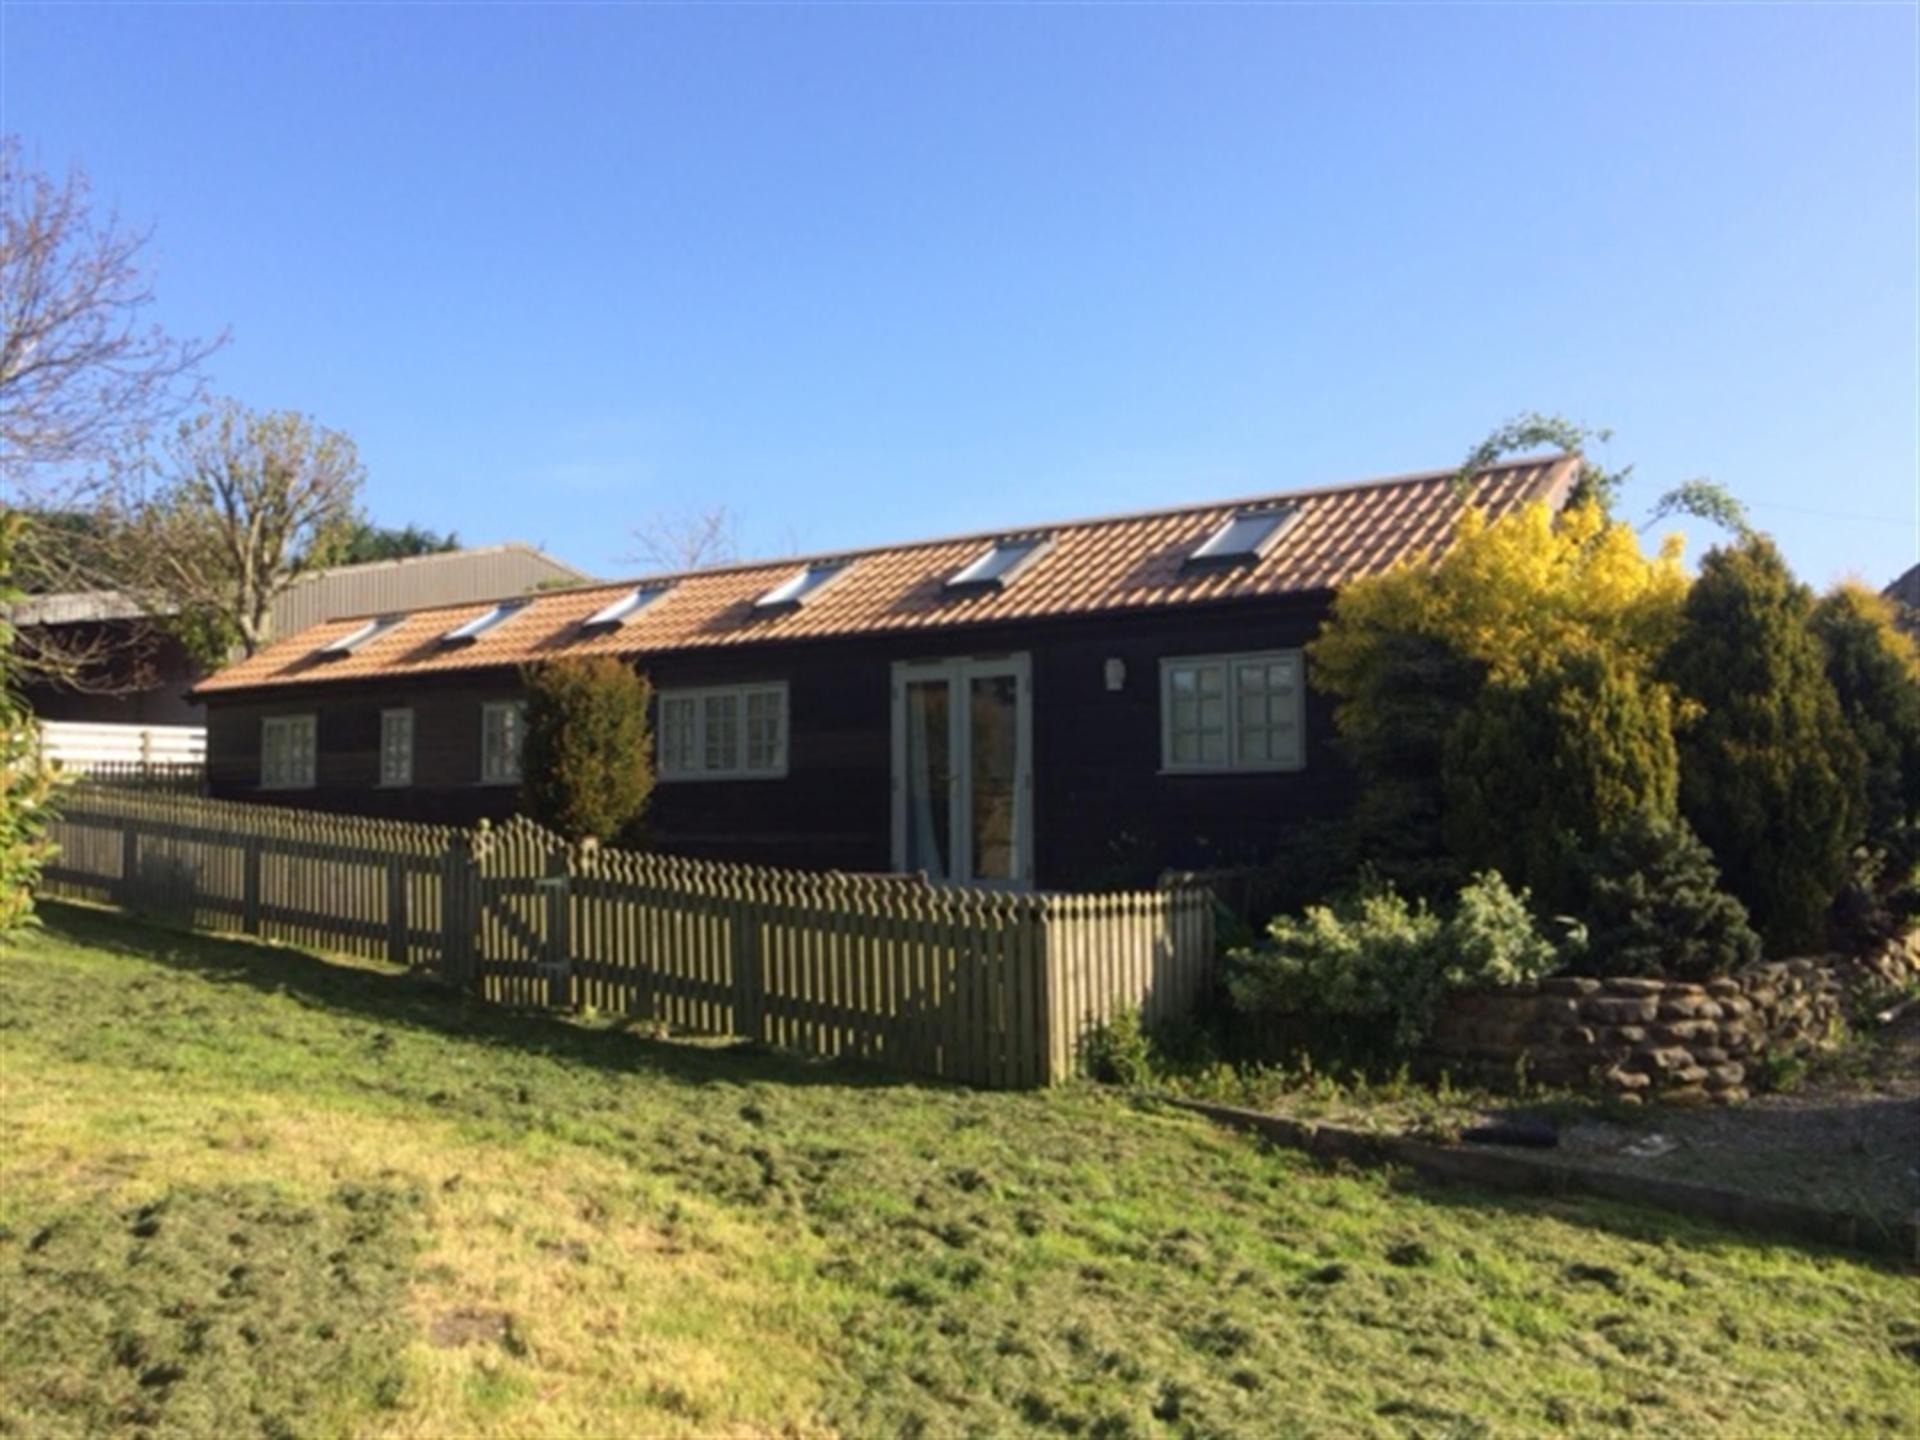 2 bedroom log cabin for sale in north yorkshire for Log cabins for sale north yorkshire